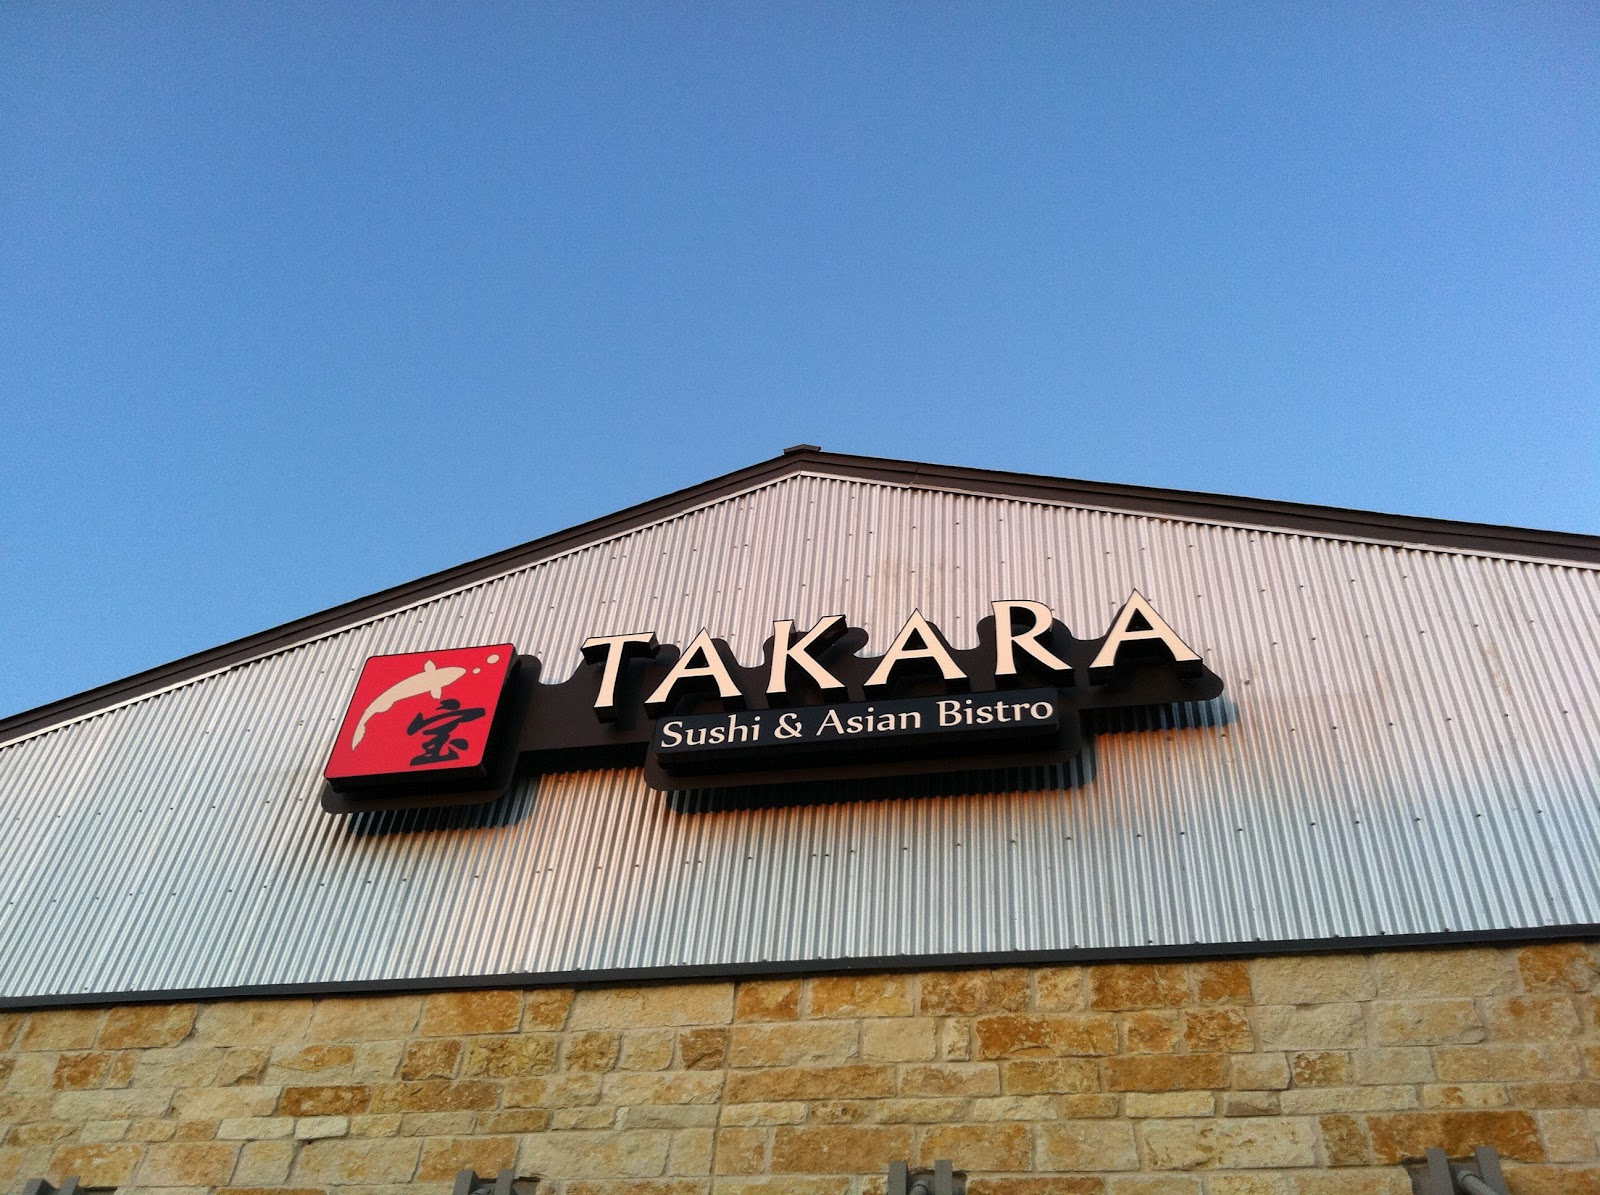 Takara Sushi & Asian Bistro   Sushi in the ATX